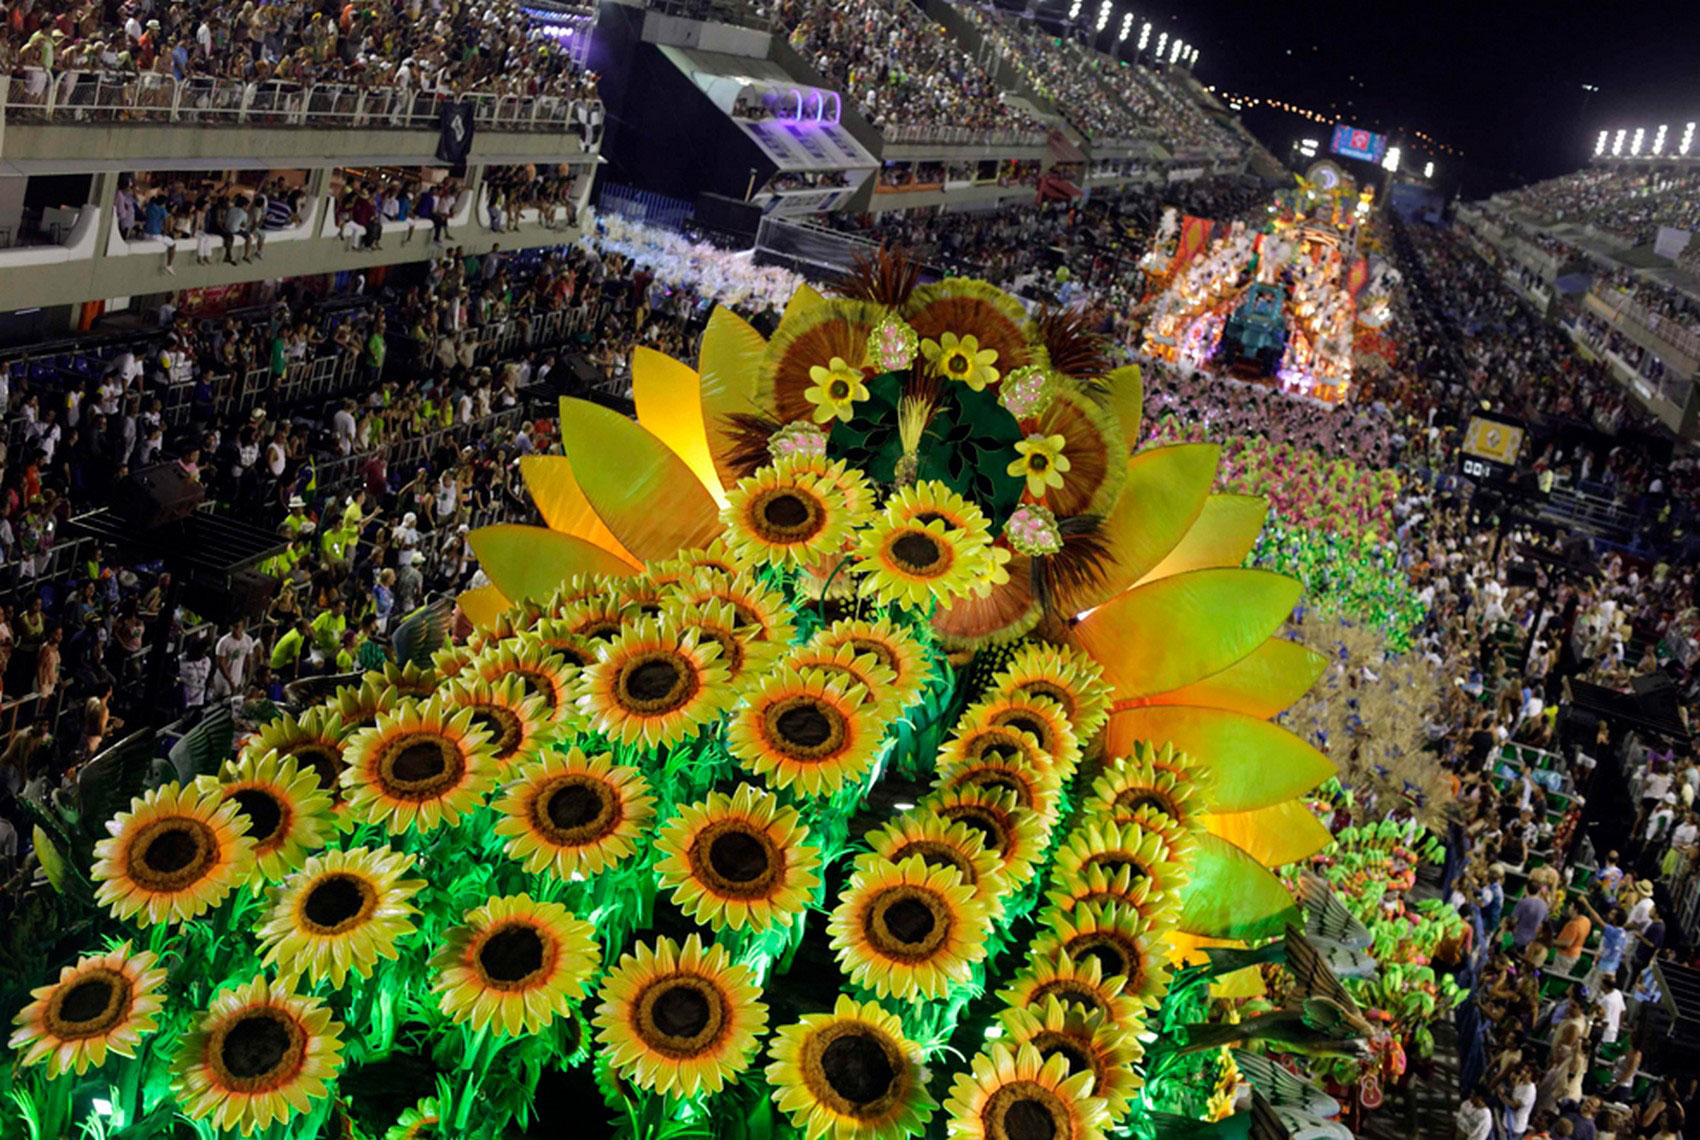 бразильский карнавал на Sambadrome, фото